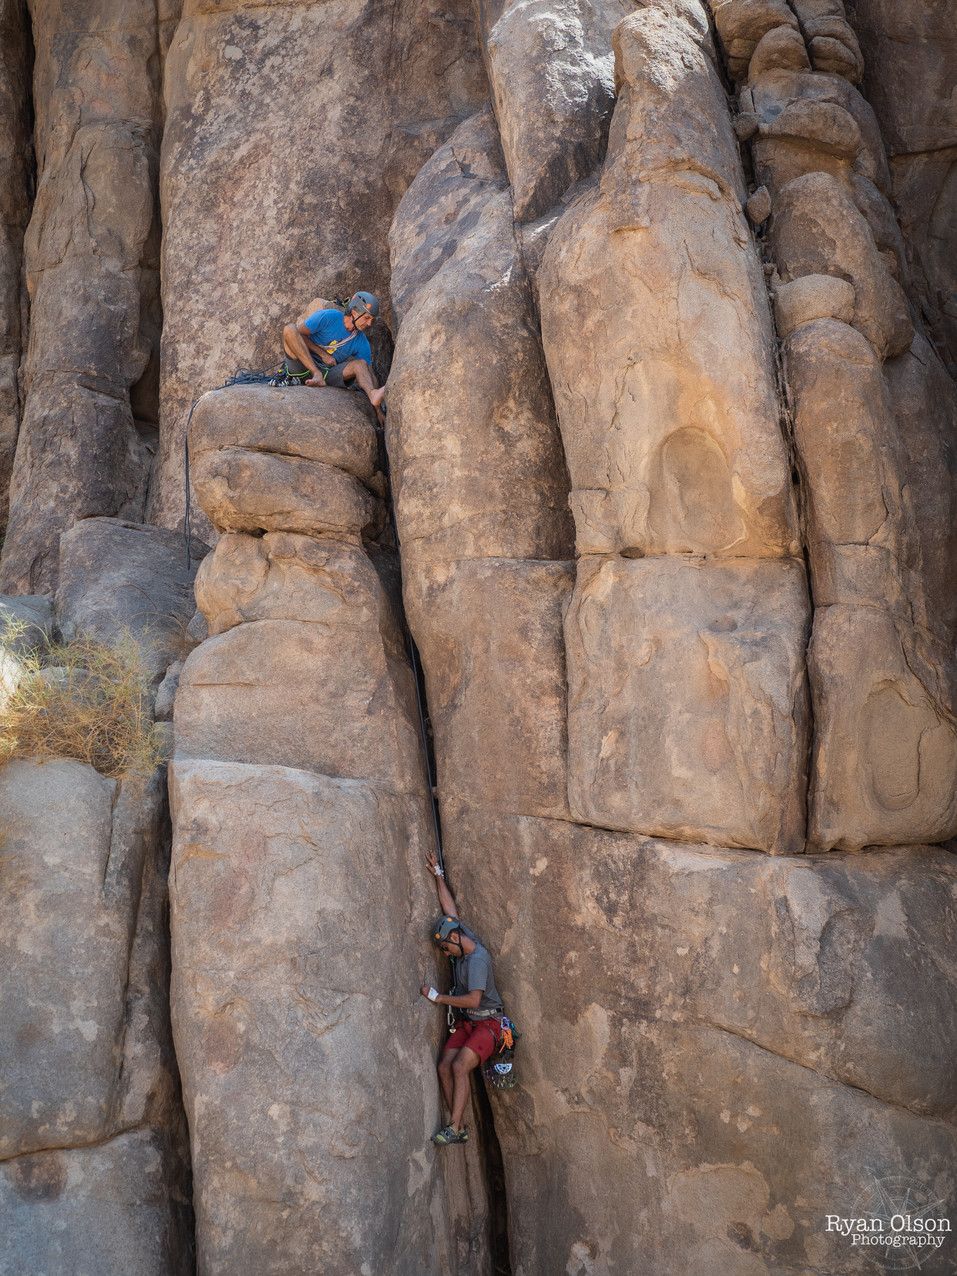 Joao Miguel and Majed Alnaji climbing a new route between Al Ula and Tabuk, Saudi Arabia